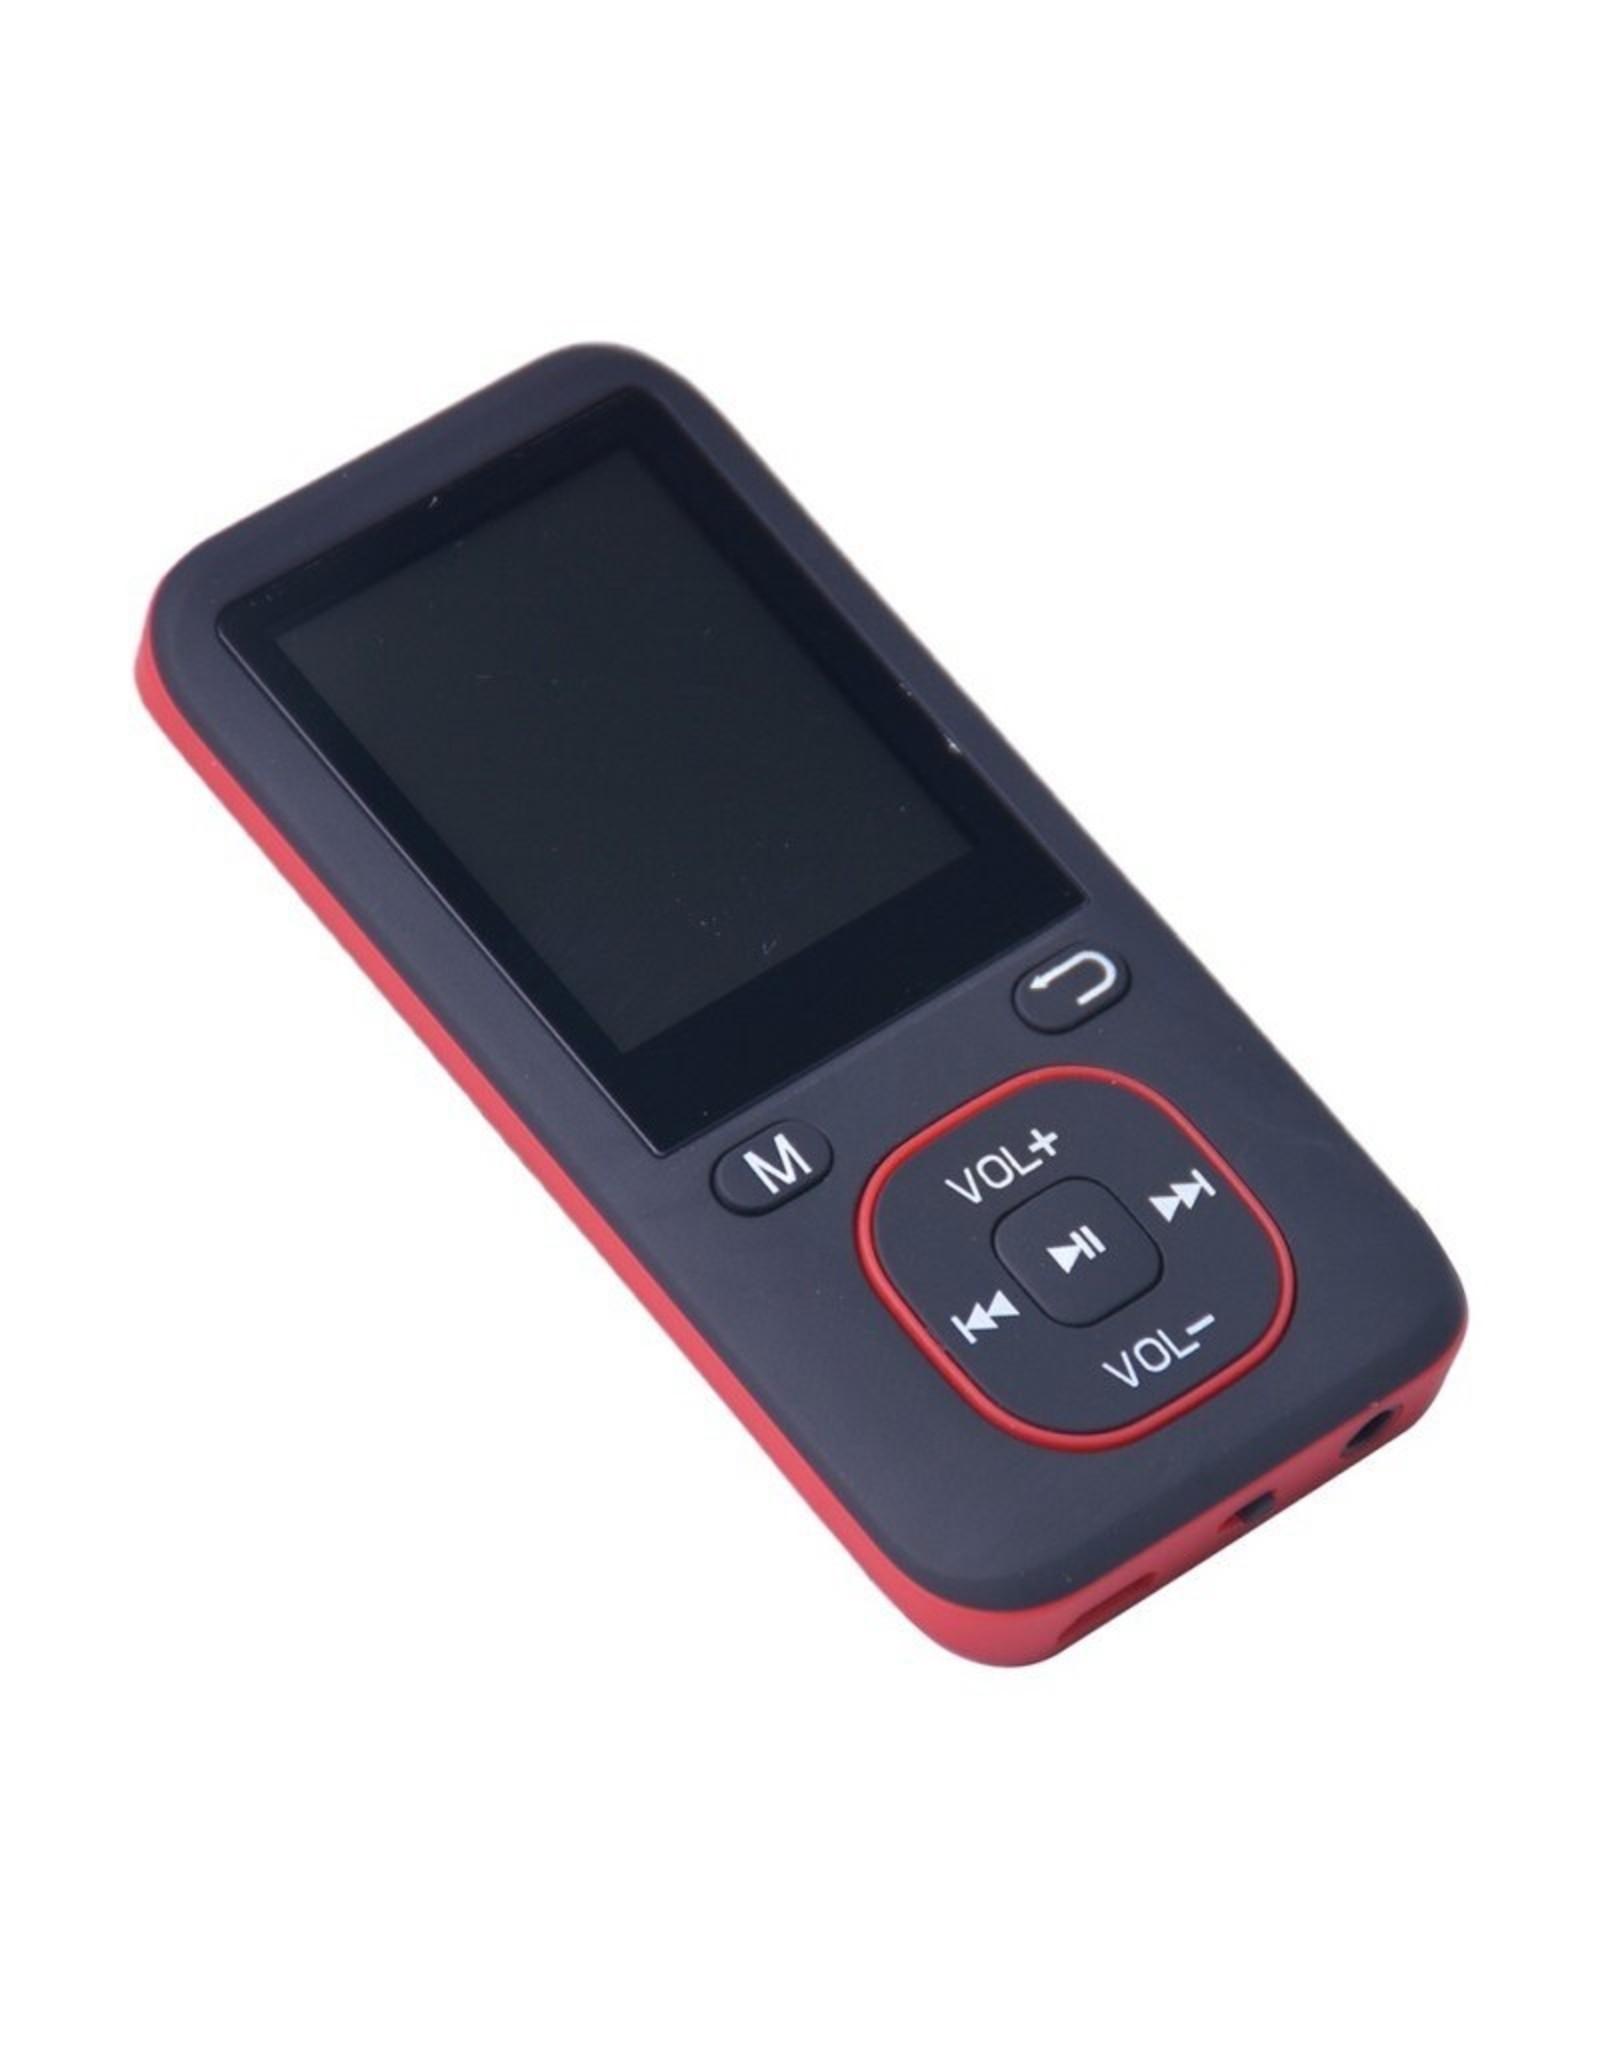 Digitale Voice Recorder - HD Ruisonderdrukking - Muziek MP3 Videospeler - FM-radio - Ebook - Audio-opname - Dictafoon - Ingebouwde Microfoon